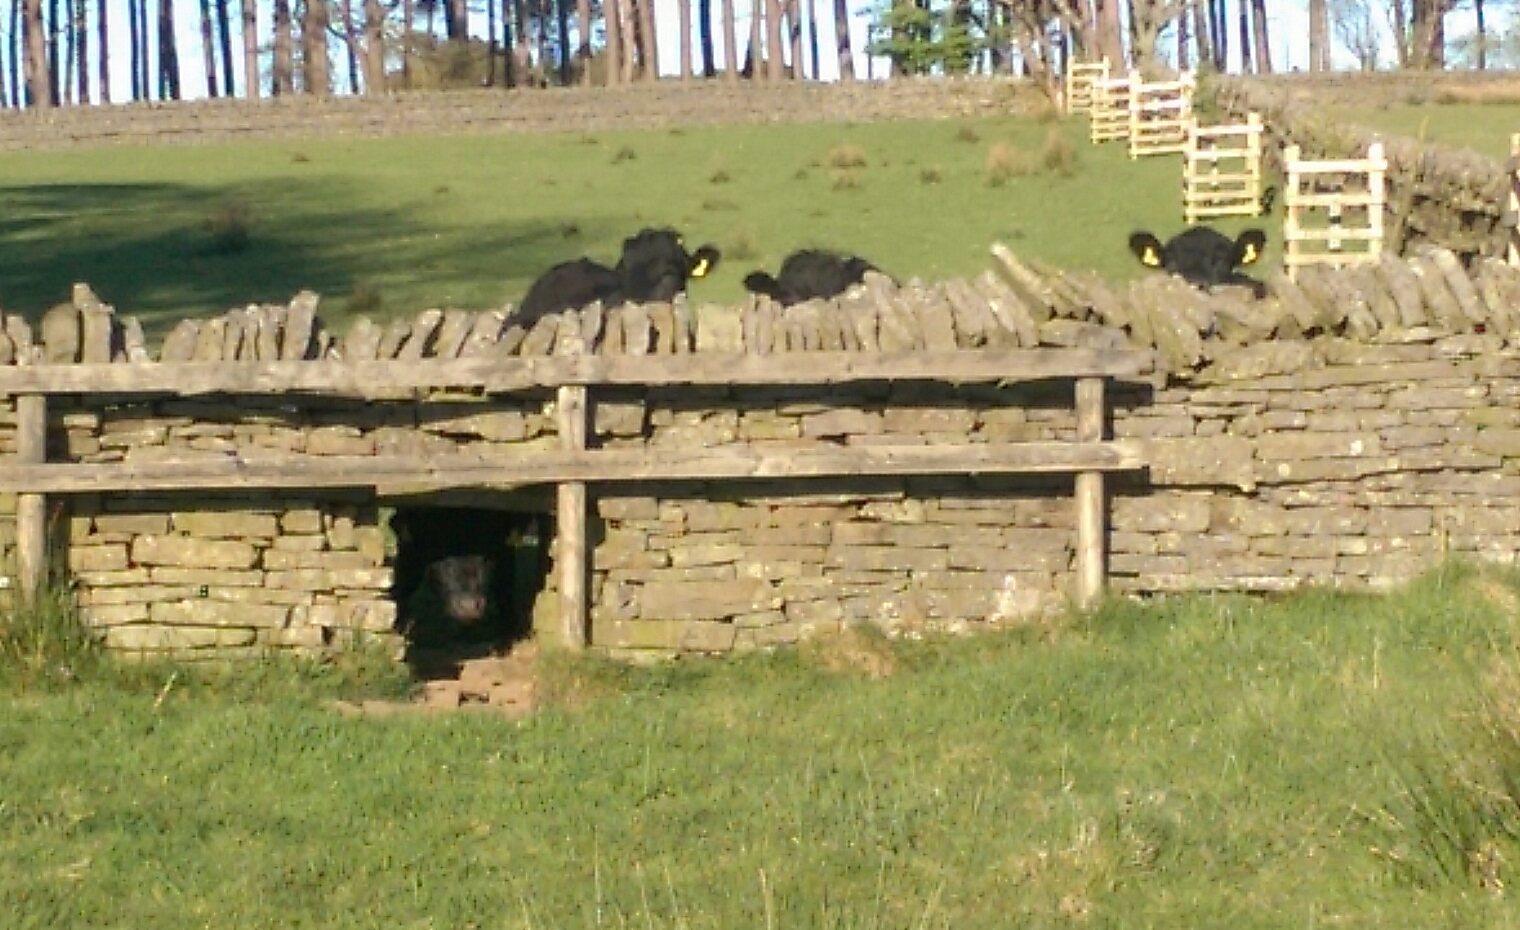 Short cows, high wall